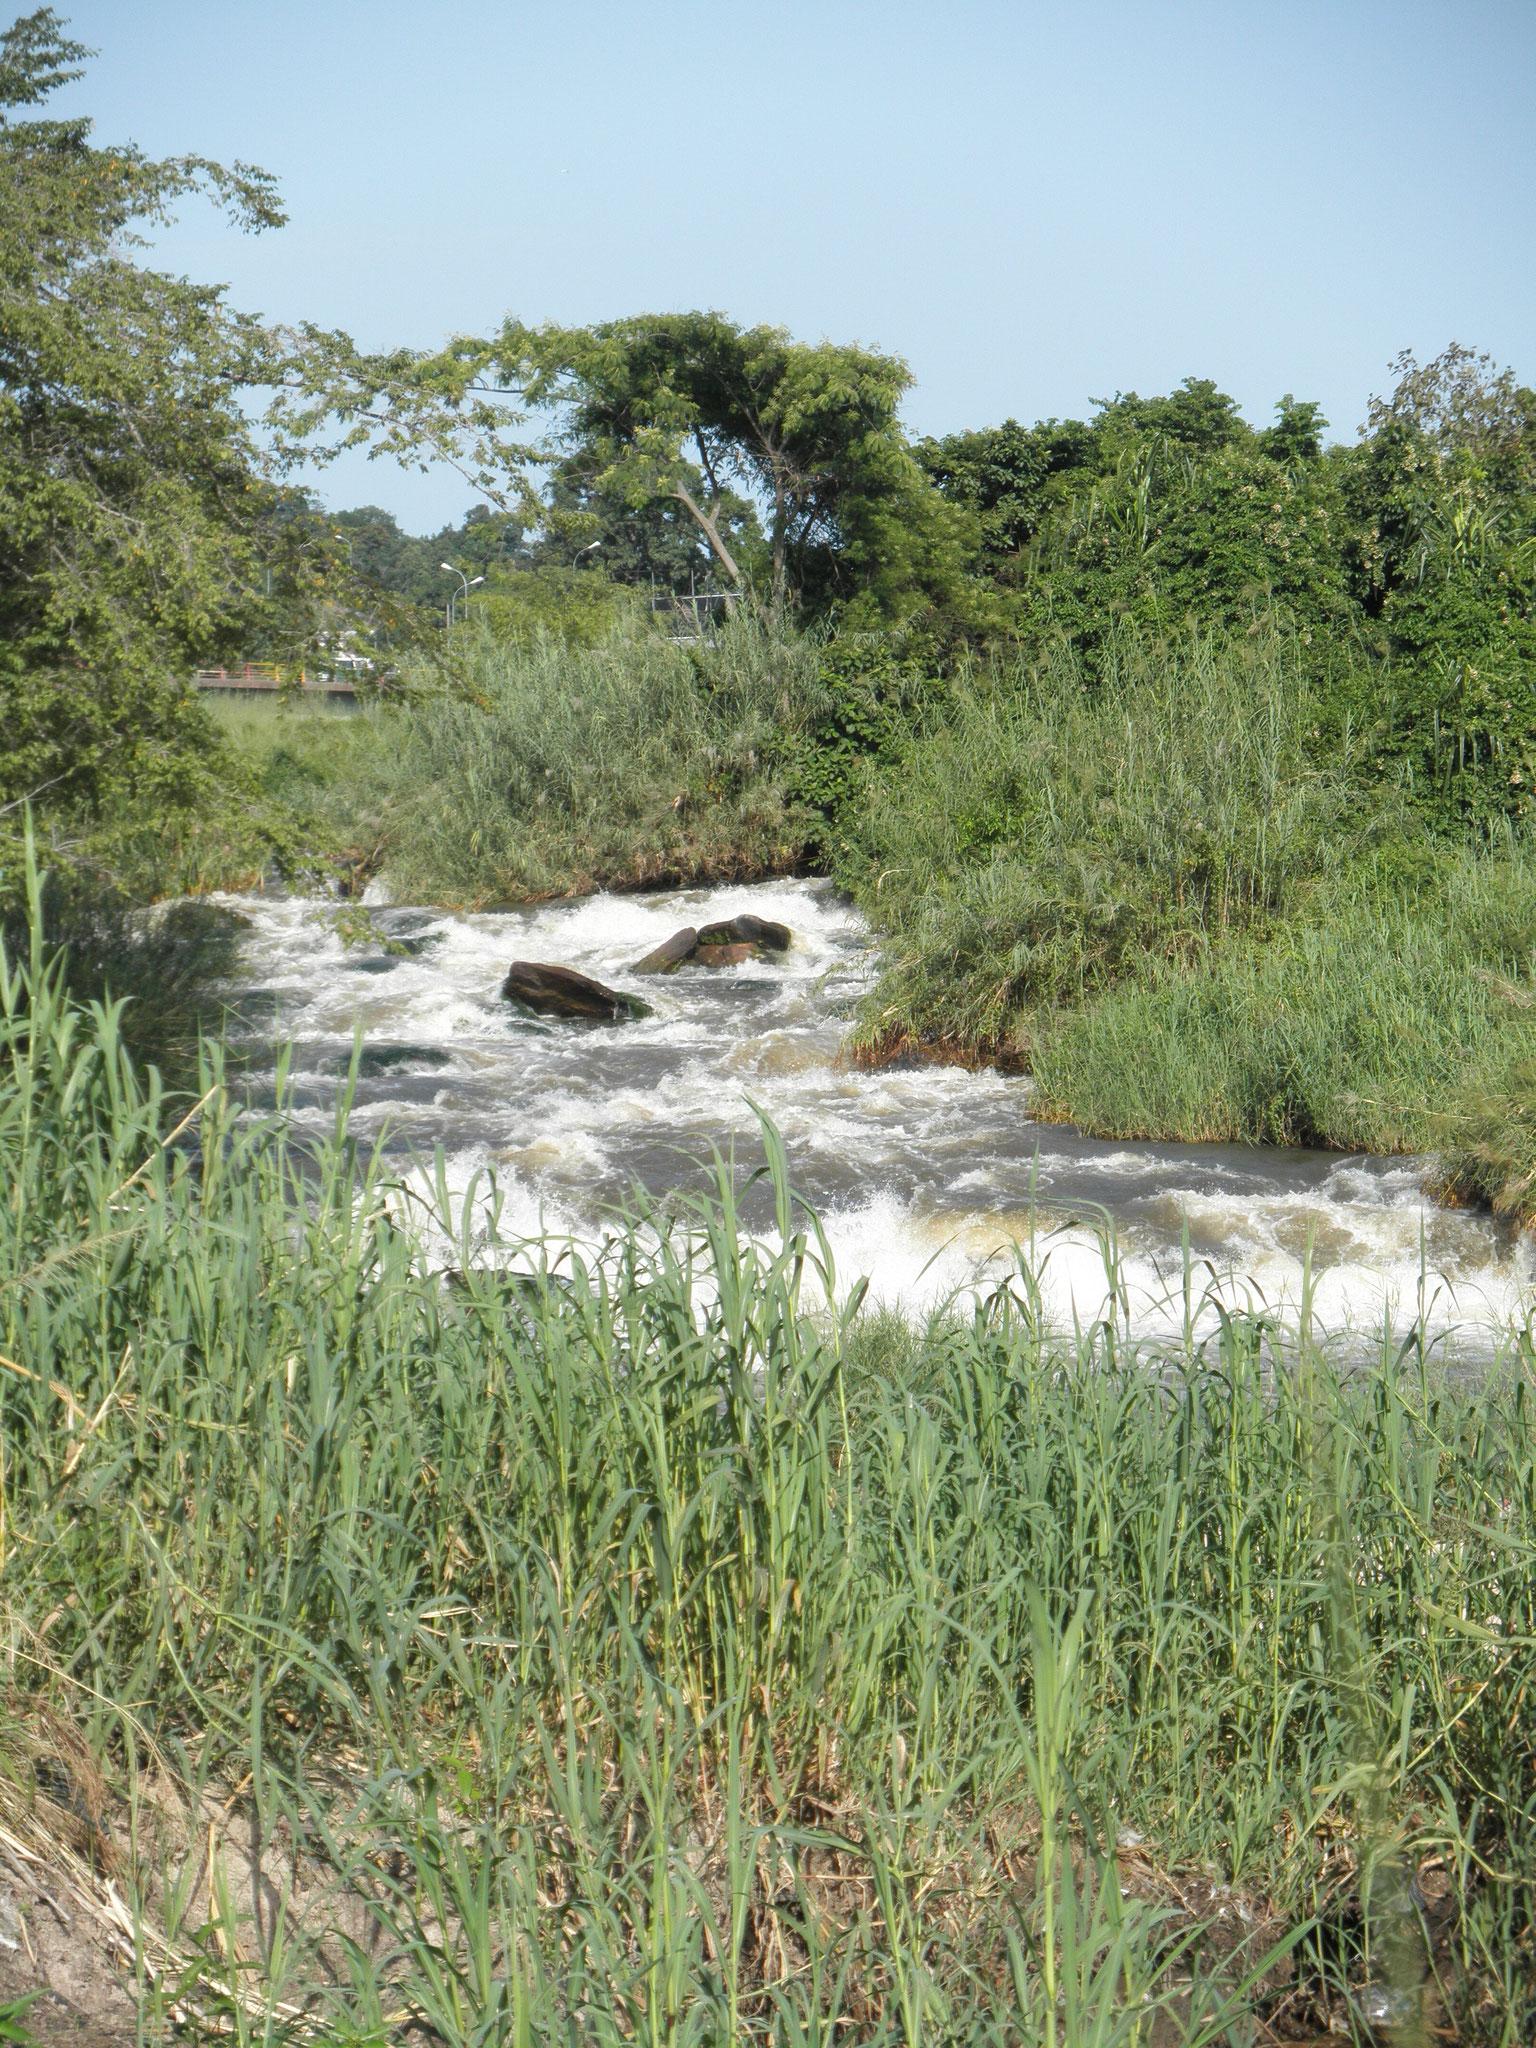 Affluent du fleuve Congo